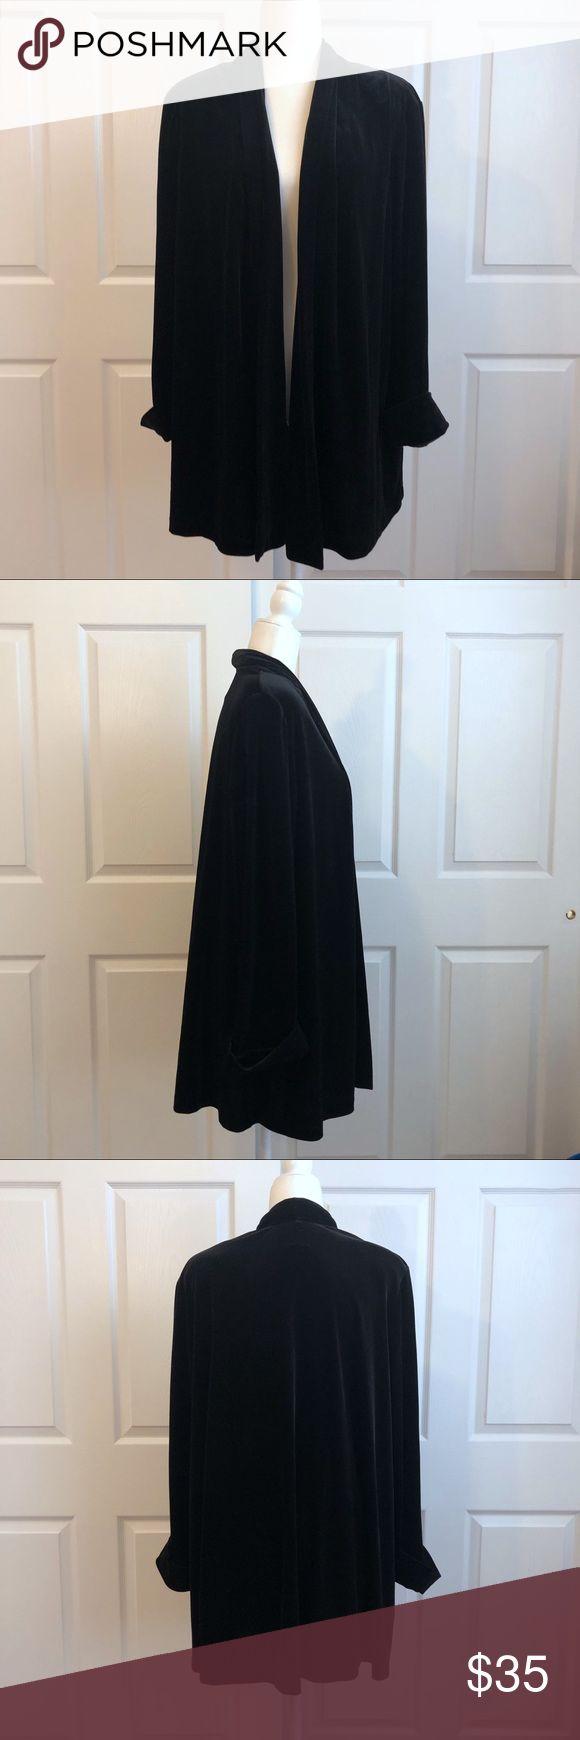 VTG Ronni Nicole Black Velvet Cardigan 1X Vintage Ronni Nicole II by Ouida Black…